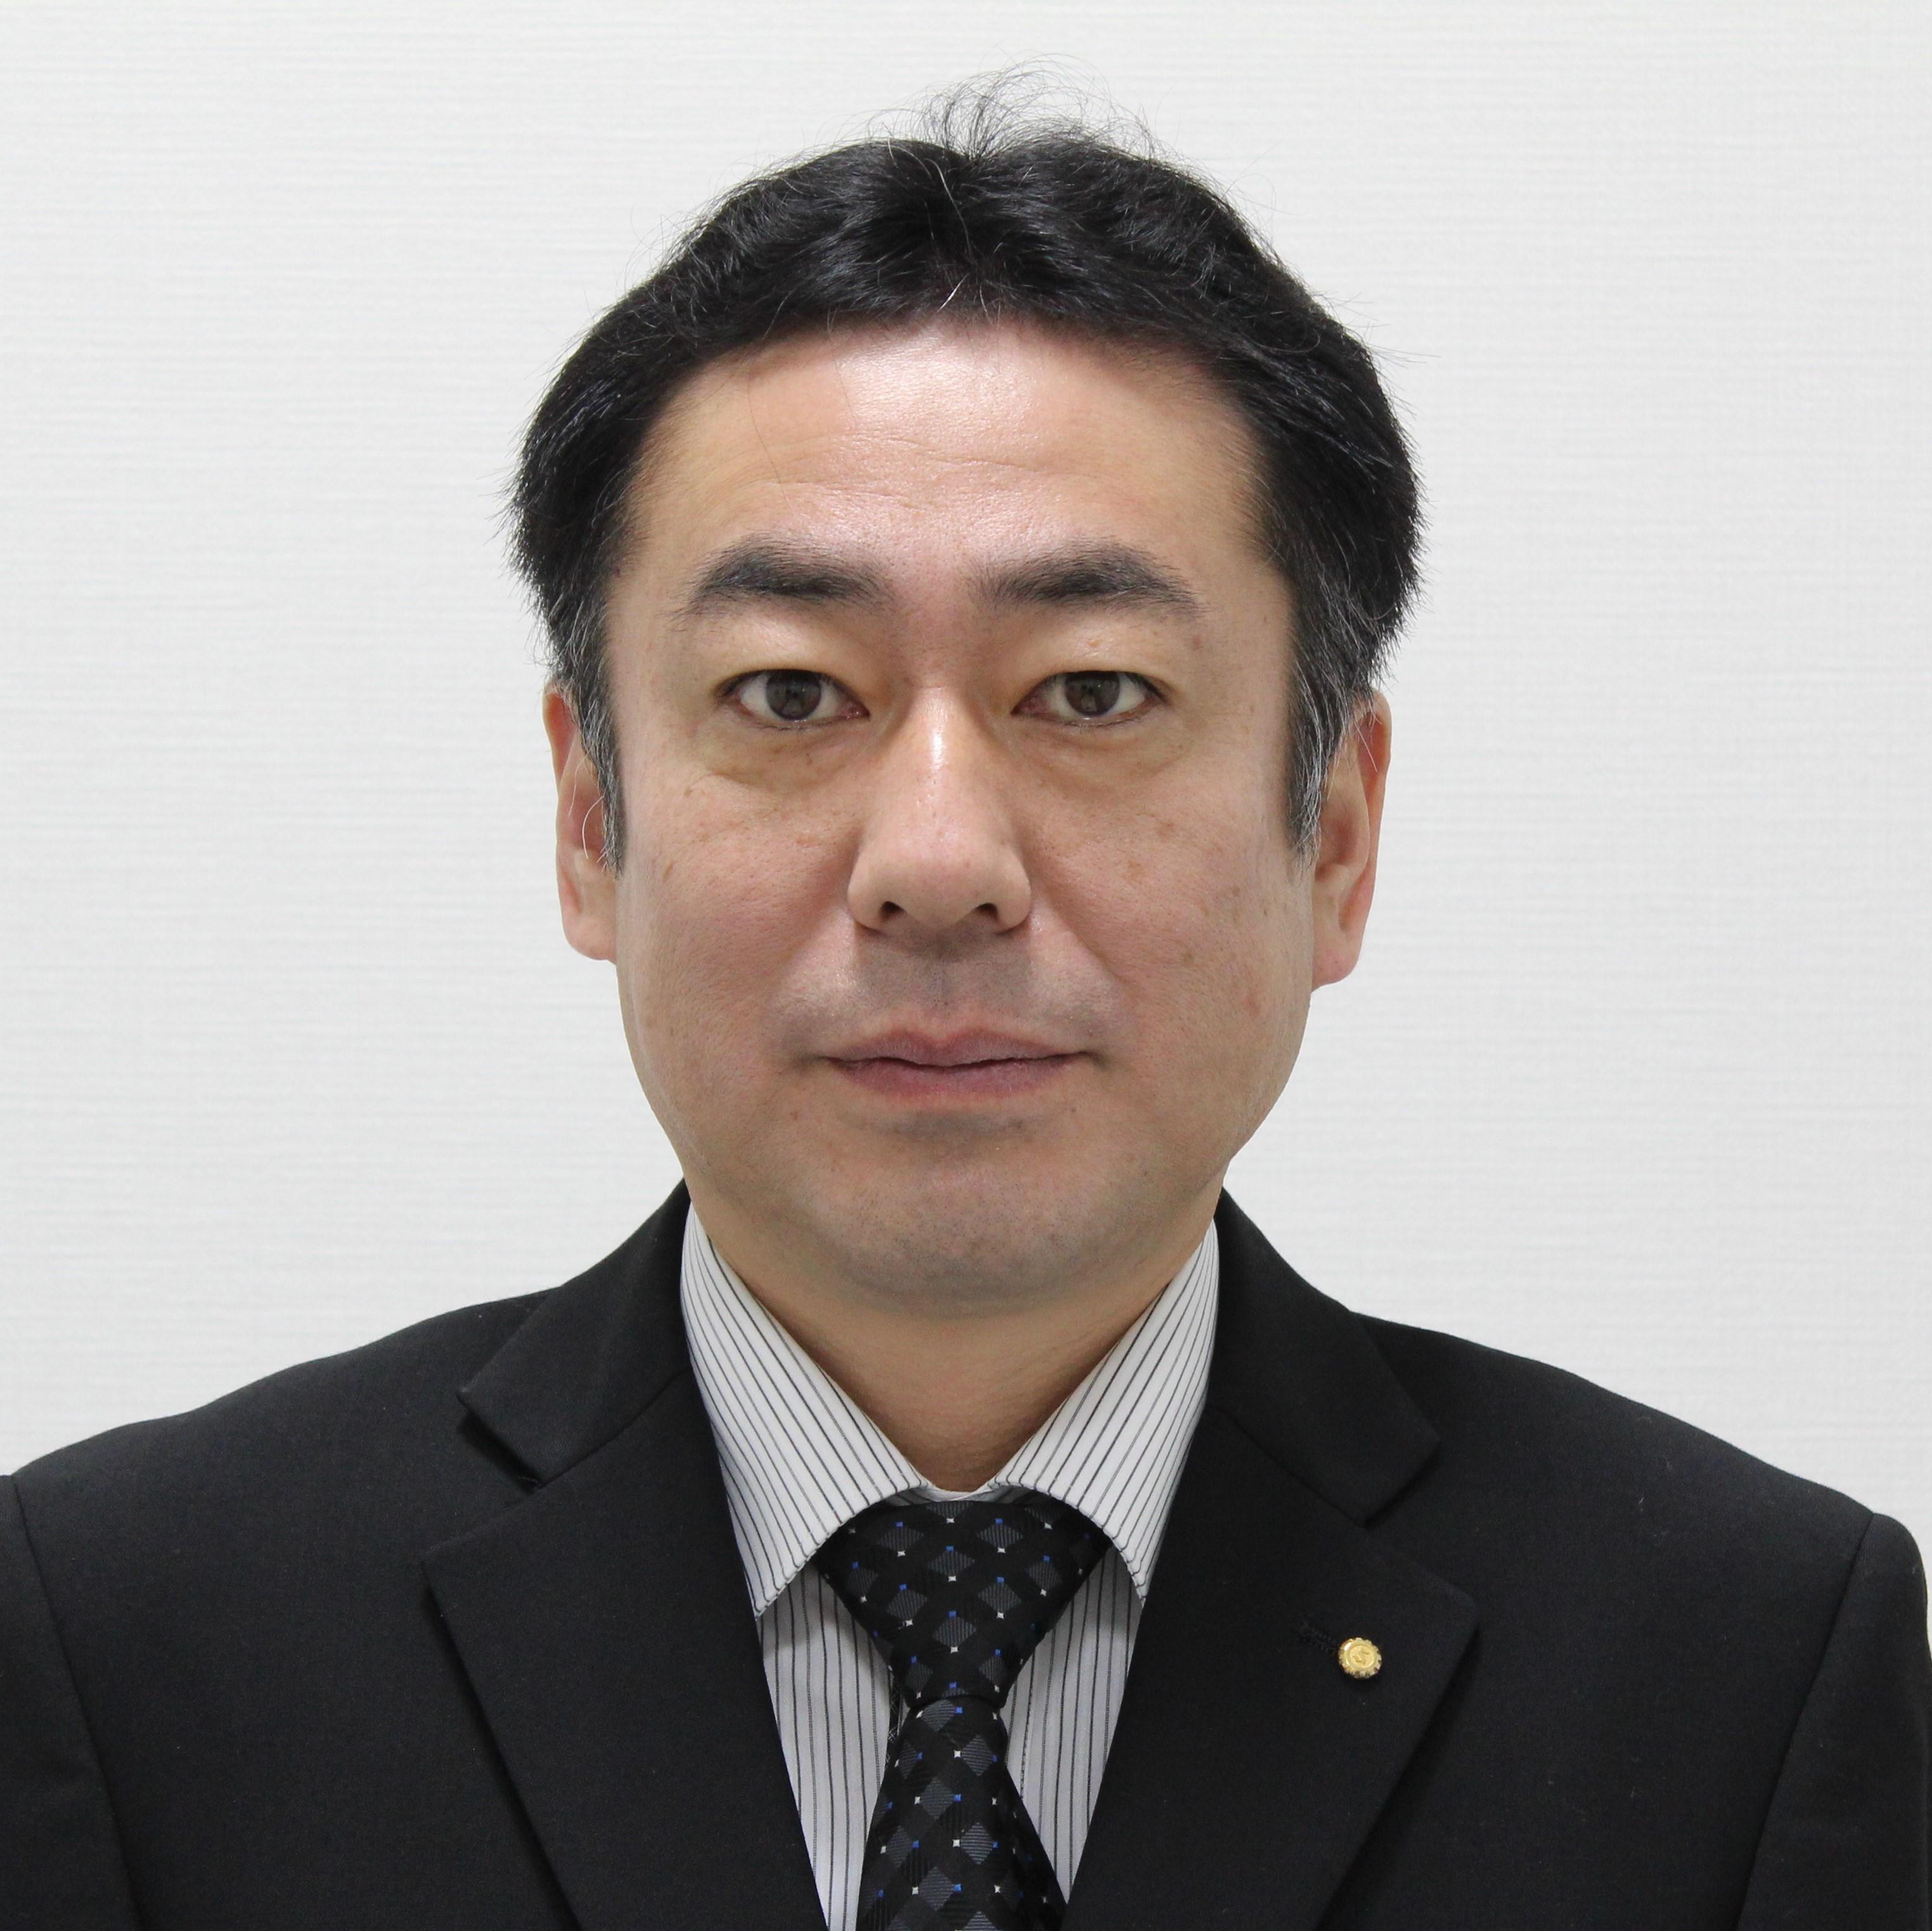 Takahiro Aoyama